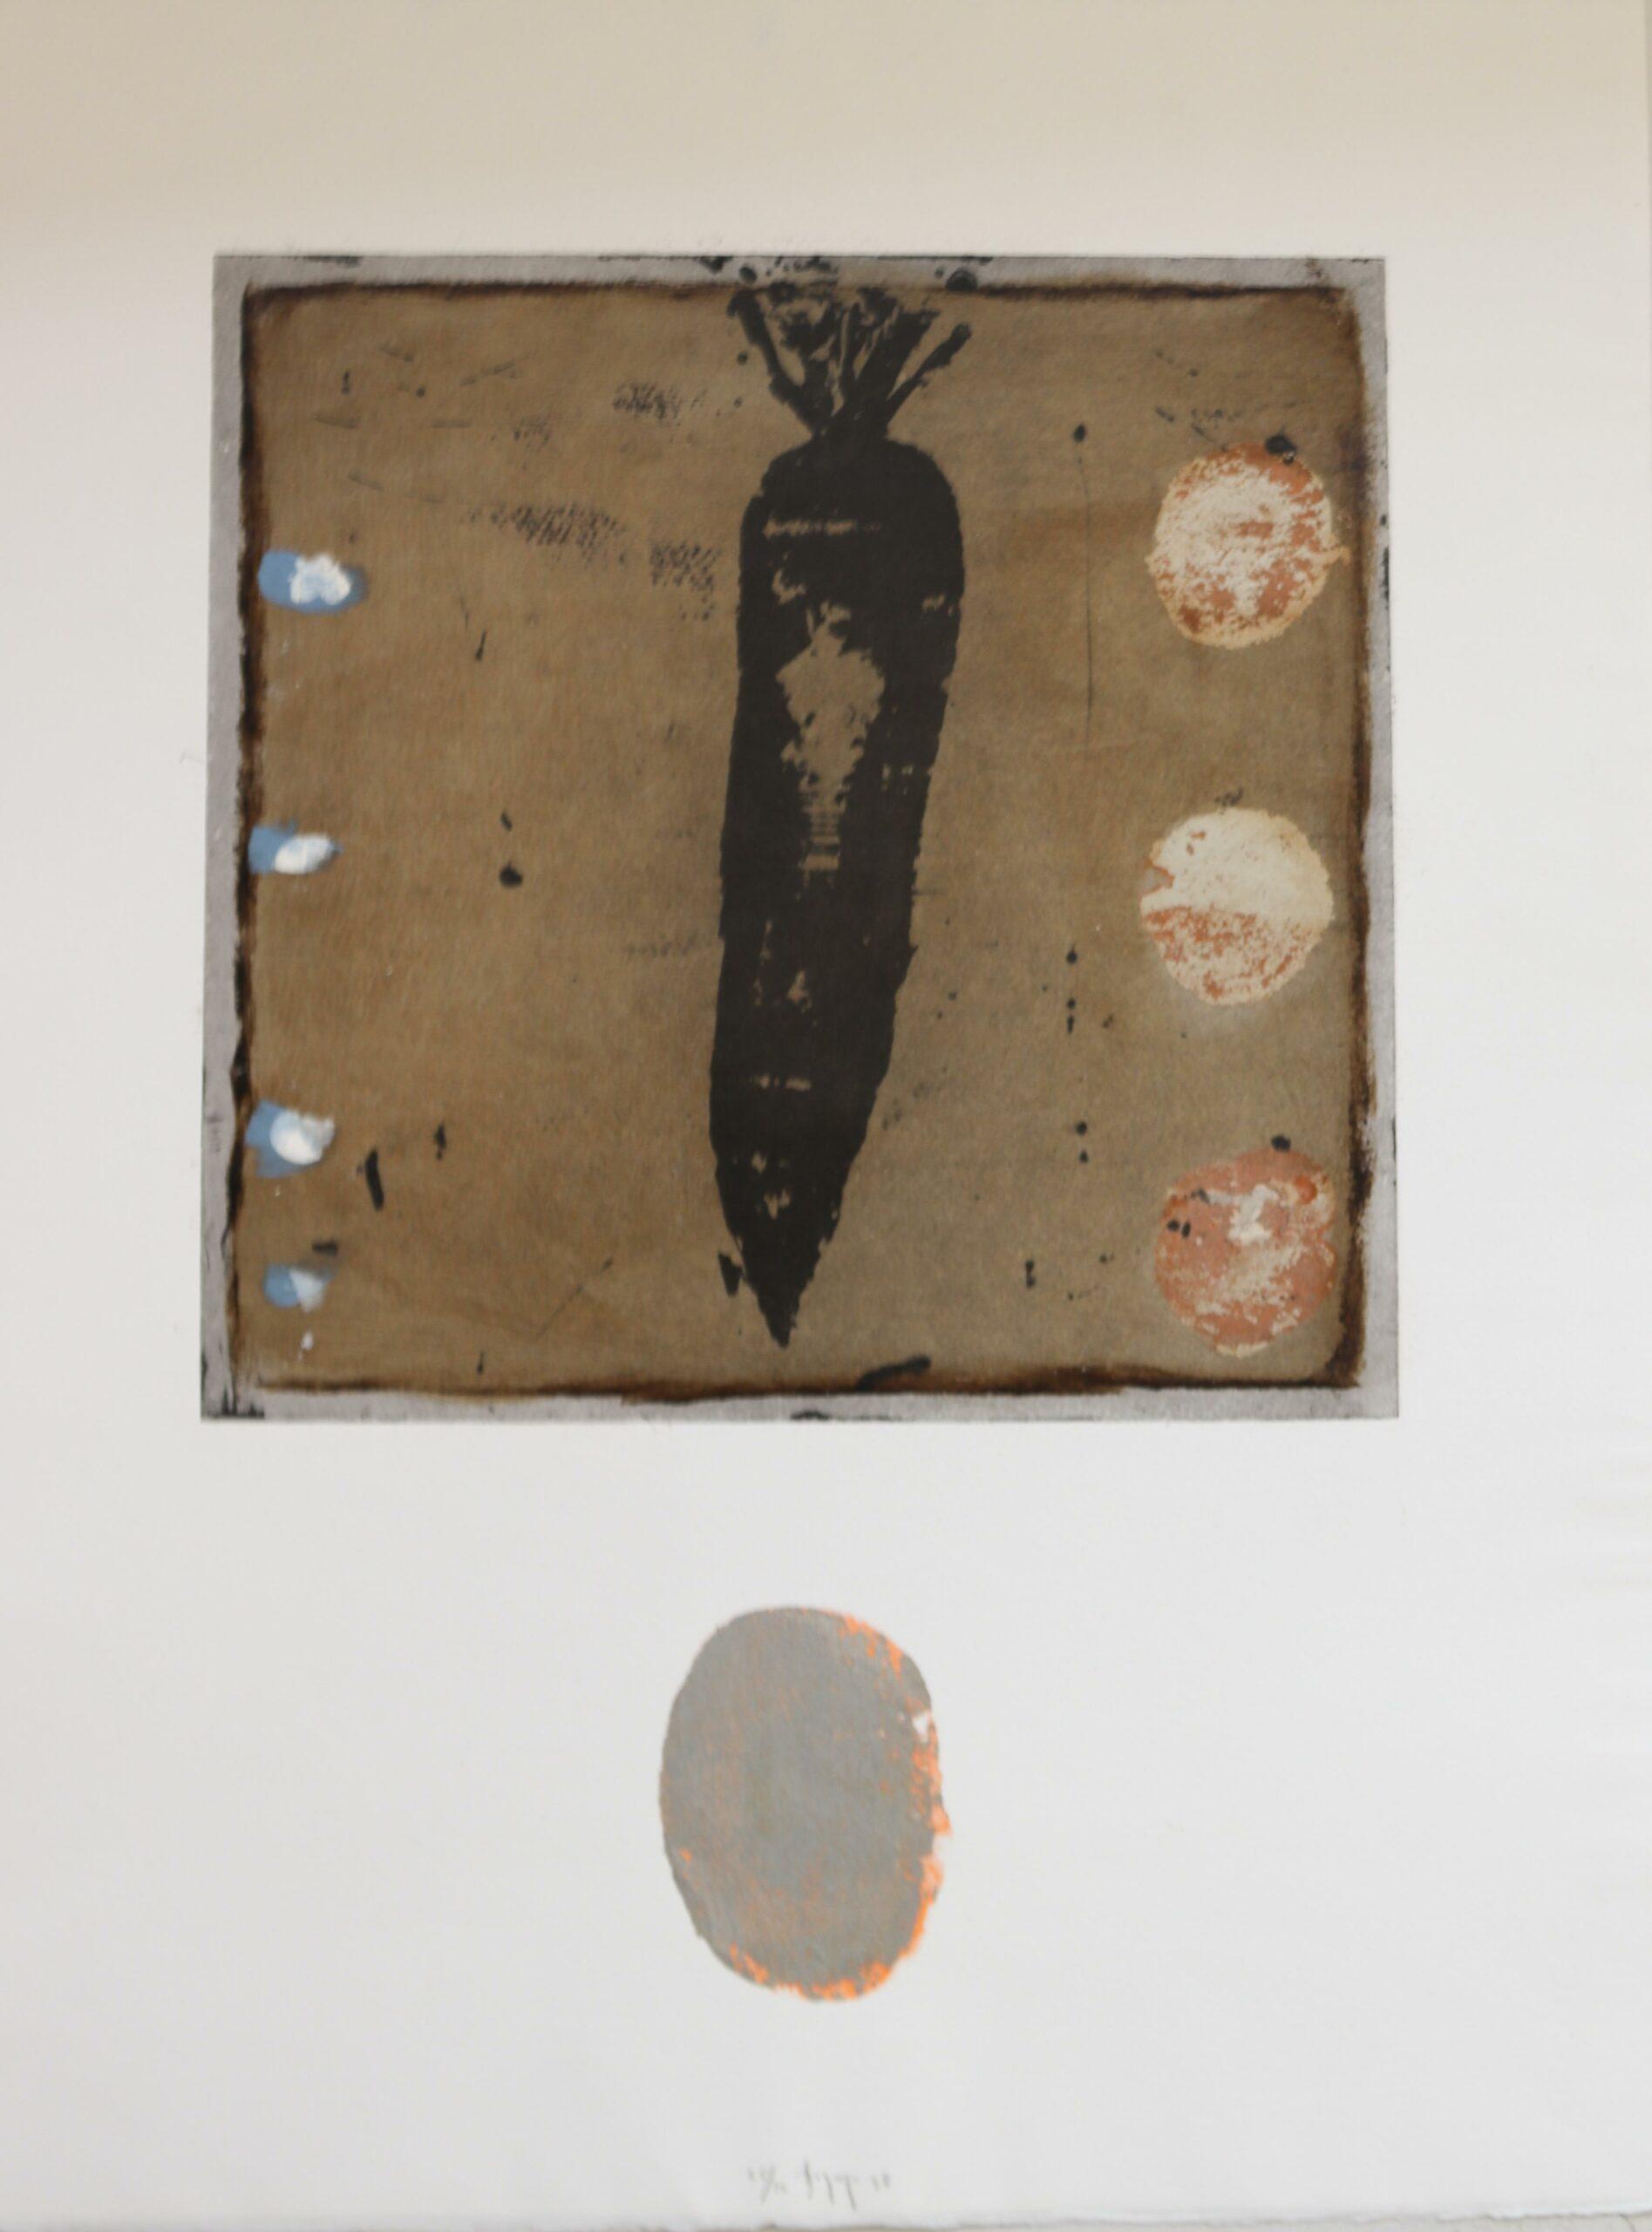 Hagége, Didier Kunst, Galerie Voigt, Nürnberg